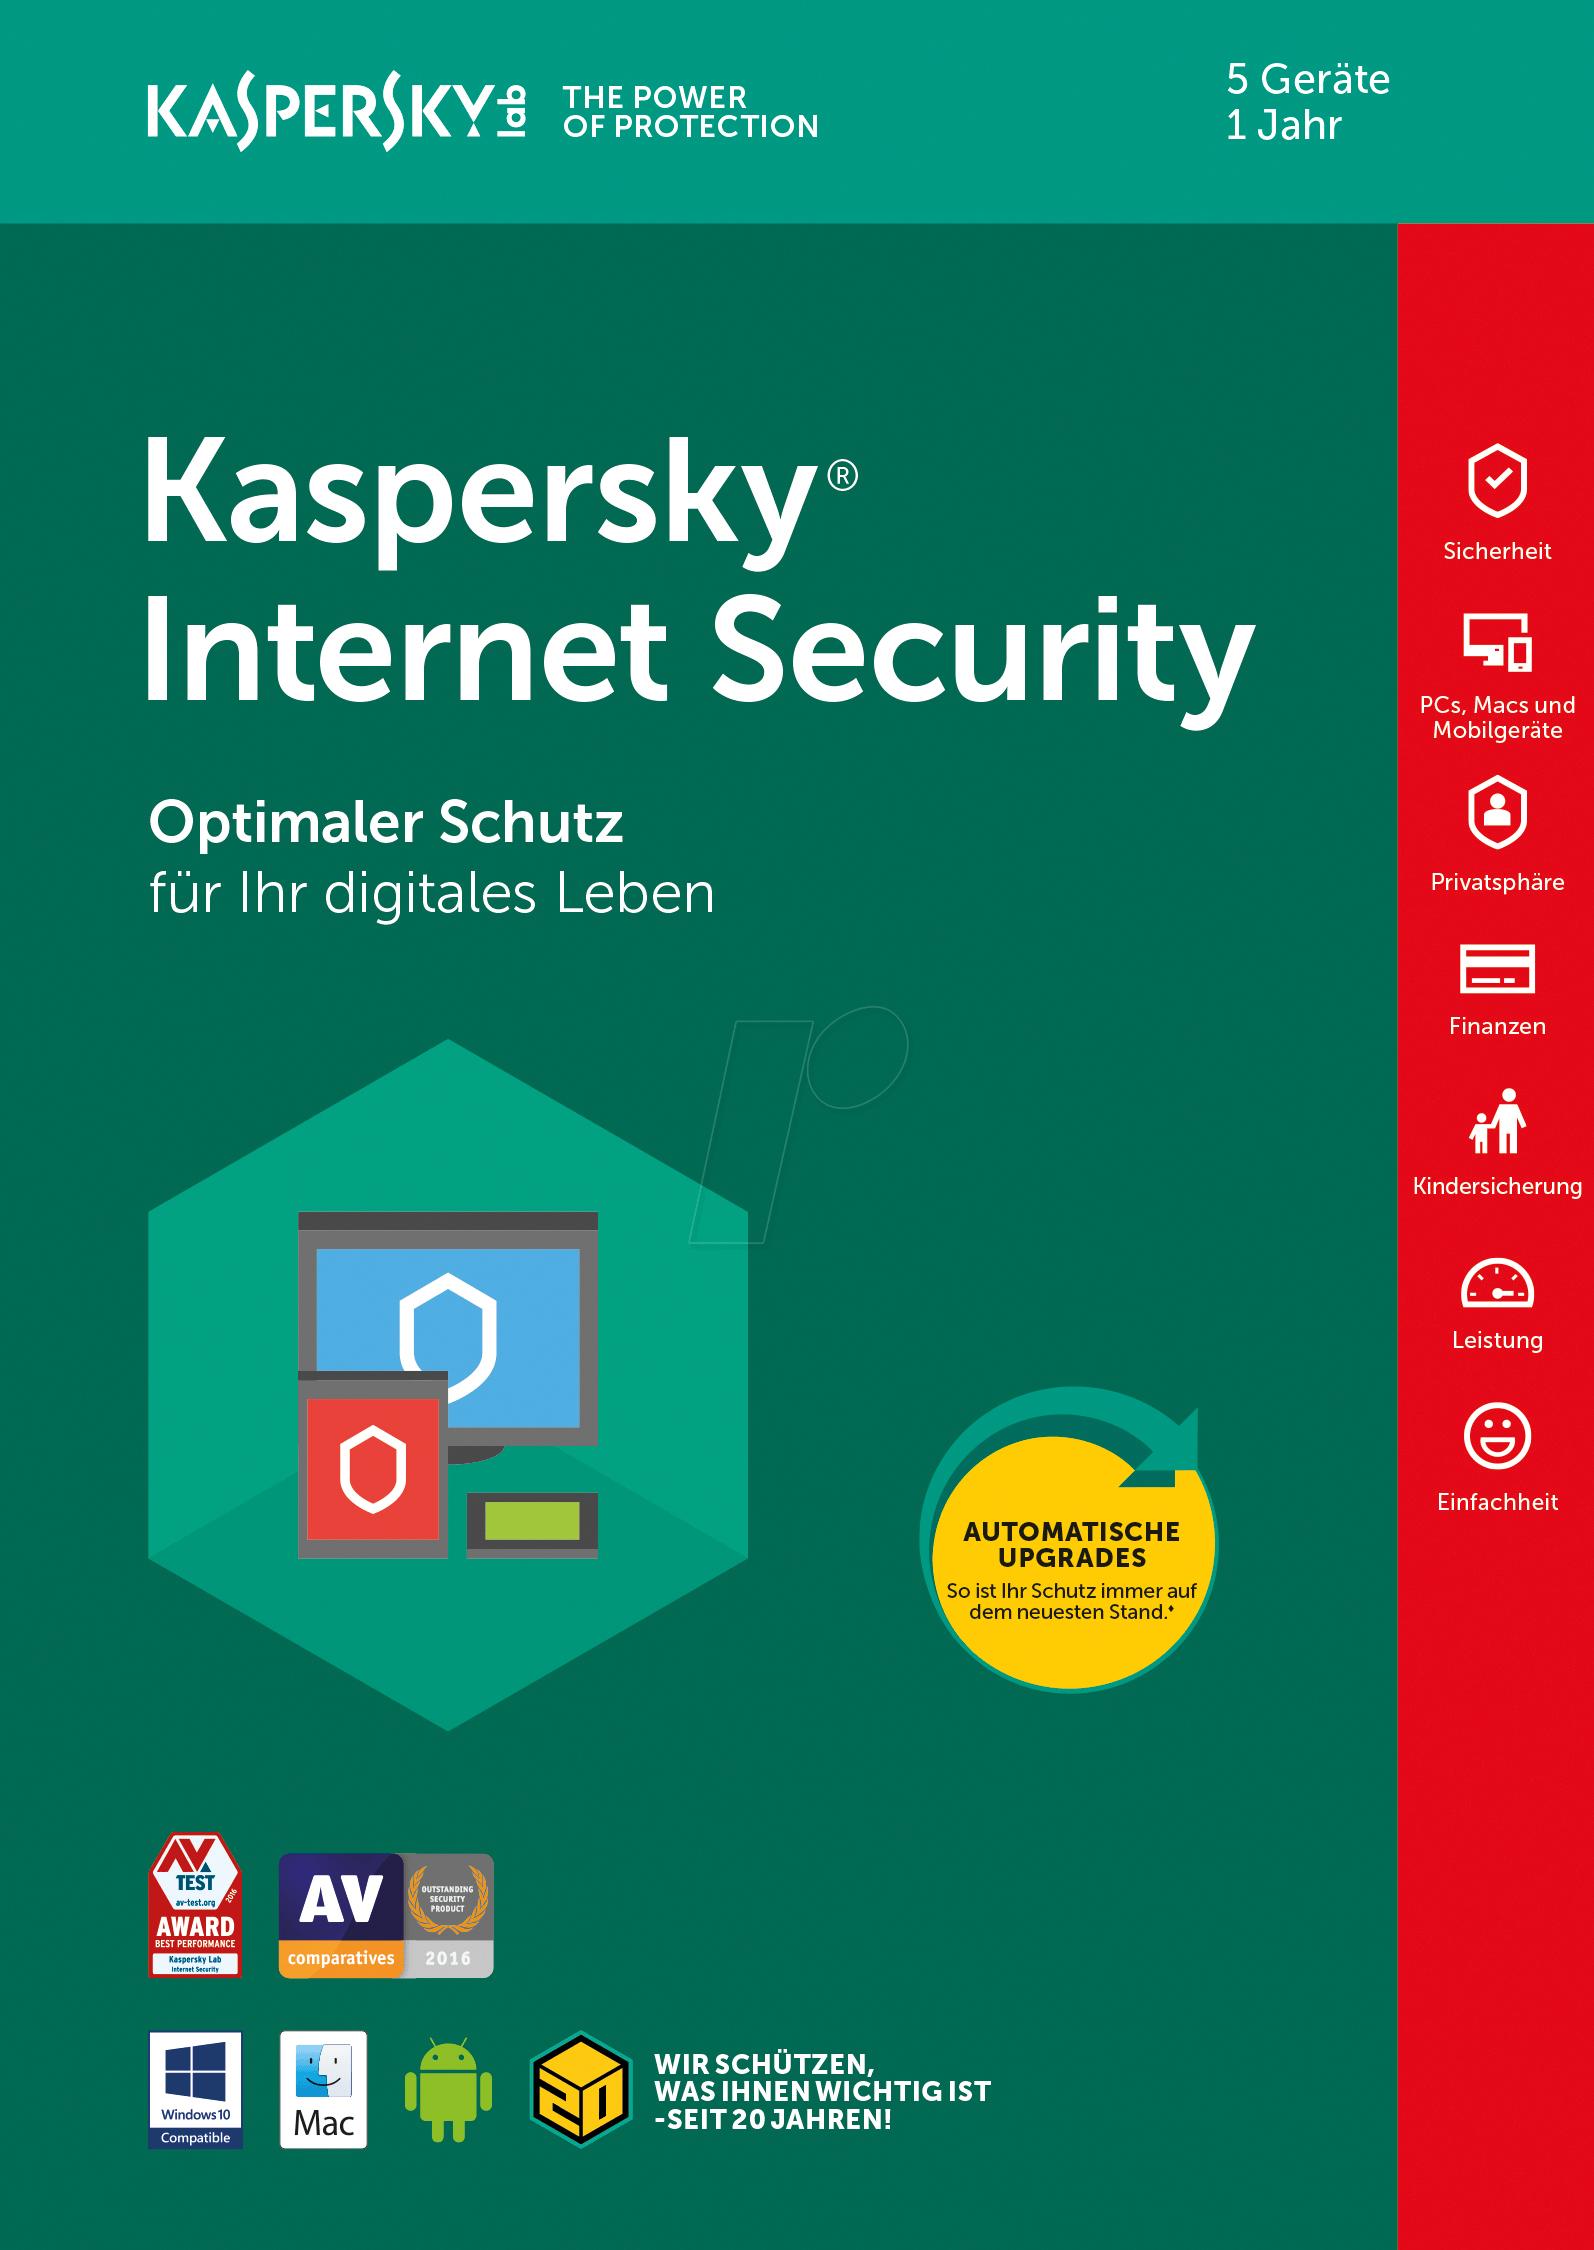 https://cdn-reichelt.de/bilder/web/xxl_ws/G500/KASPERSKY_IS2018_5U_01.png